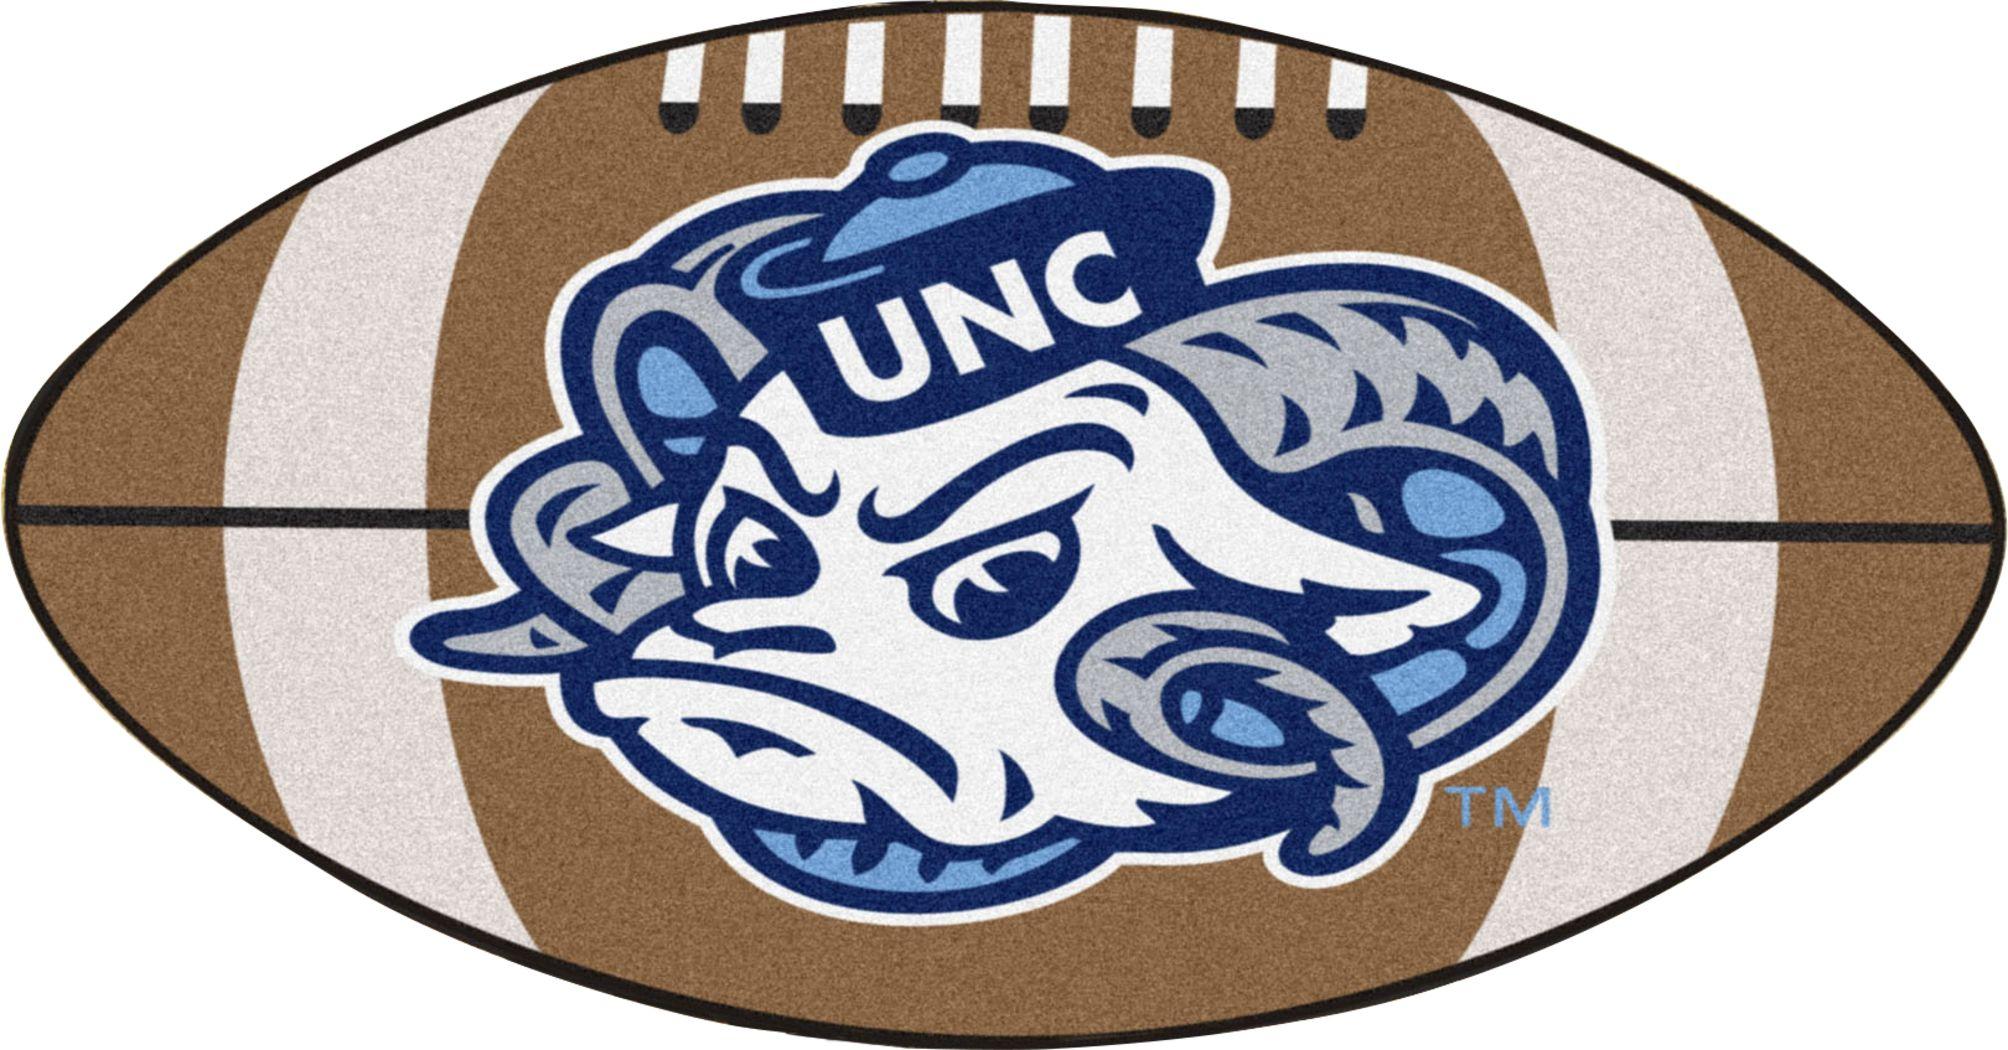 "NCAA Football Mascot University of North Carolina 1'6"" x 1'10"" Rug"